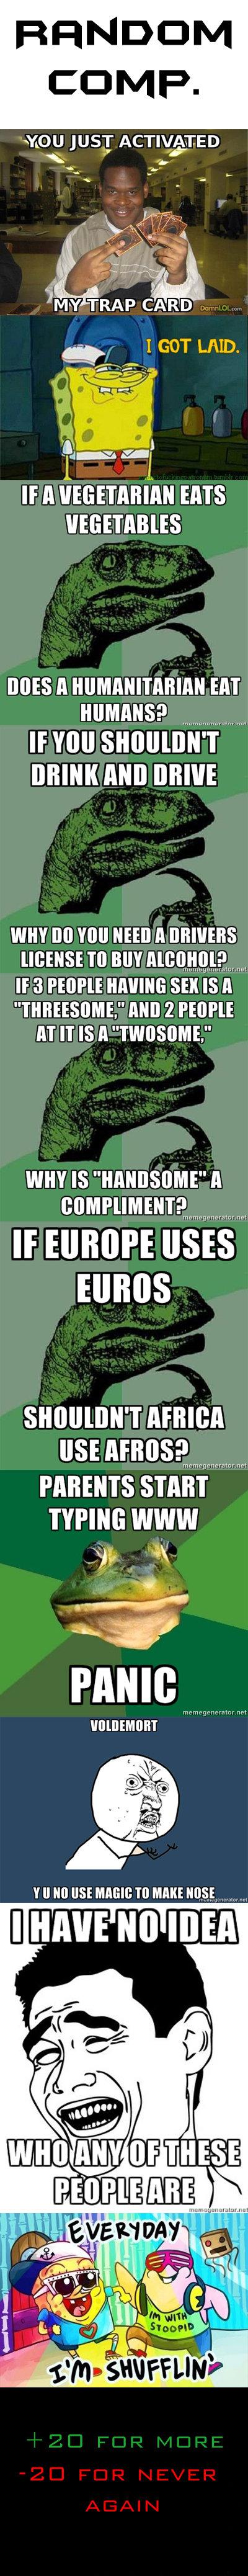 "Random comp1. . Allu JUST ACT"" ' TRAP CARD I GOT LAID. E iii If A VEGETARIAN ms VEGETABLES l EAT HUMANS? rra WHY no van nun A Fil HAVING SEX IS ii"" If EUROPE to"